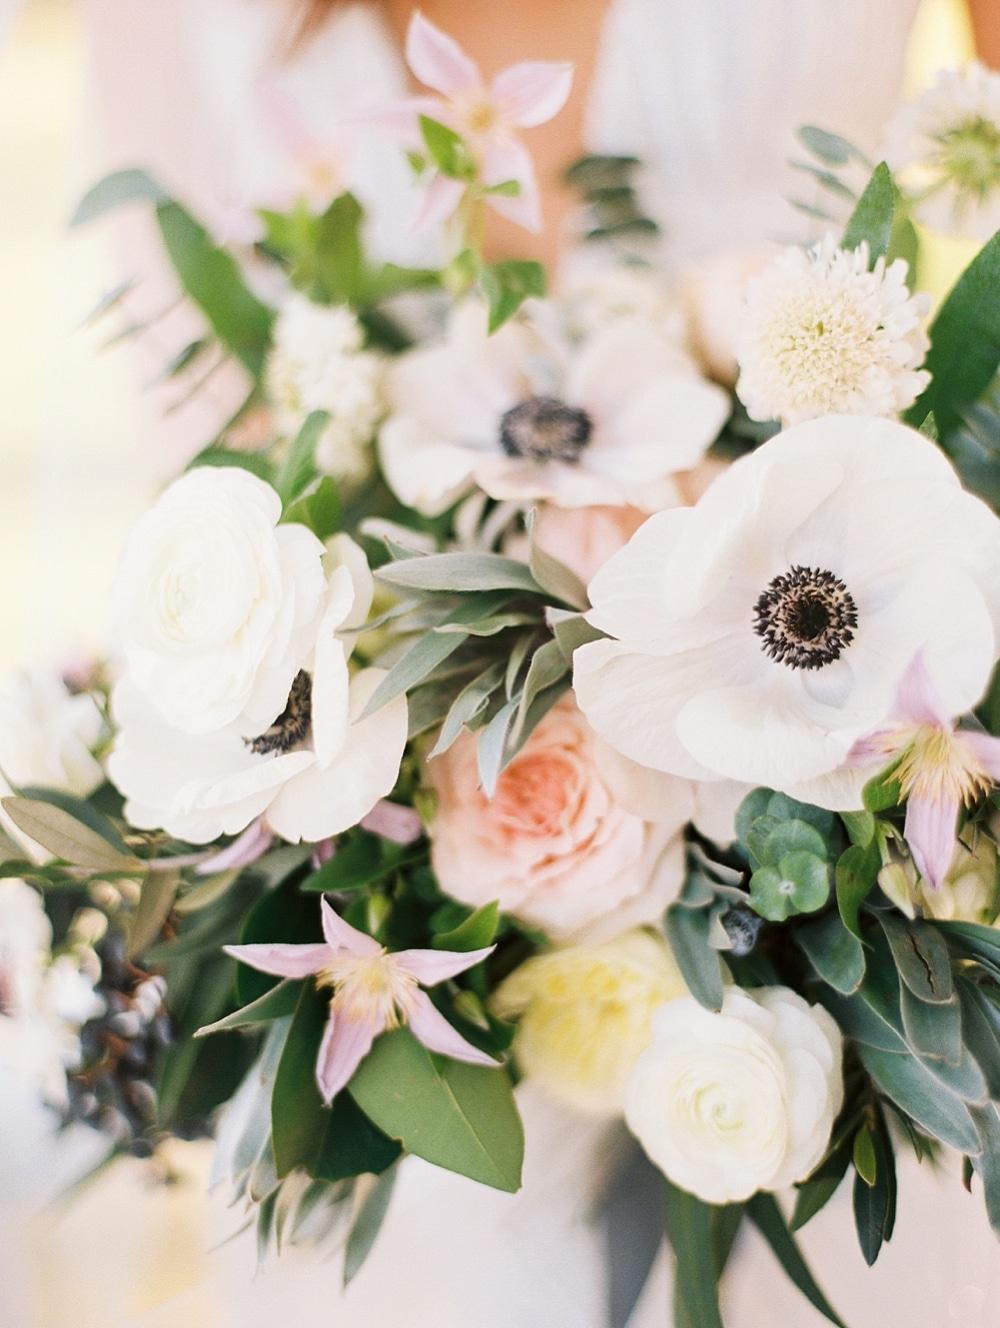 Kristin-La-Voie-Photography-Austin-Wedding-Photographer-barr-mansion (38 of 86)